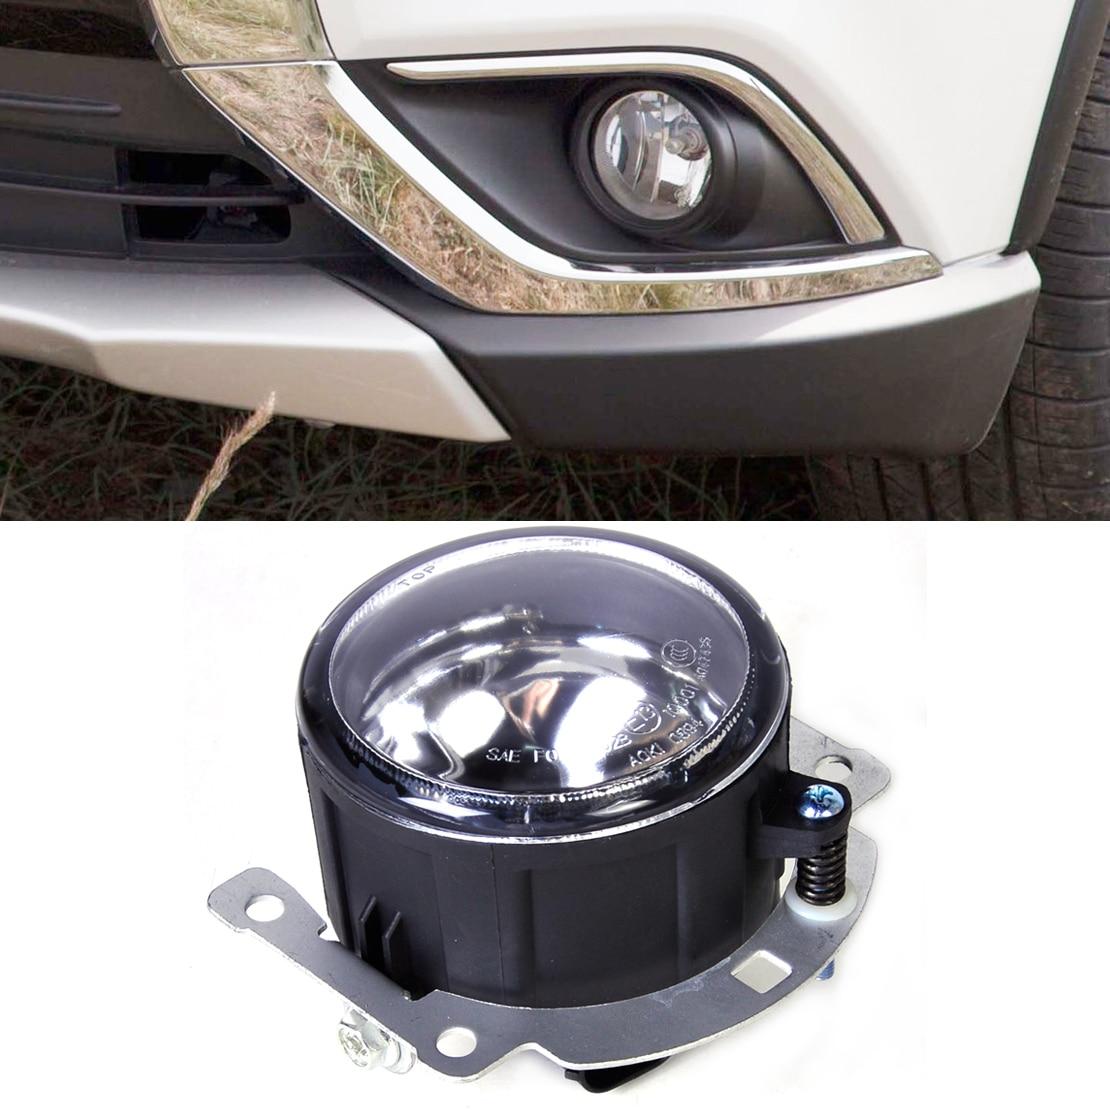 DWCX New 12V 55W 1PC Left=Right Front Fog lamp Light 8321A467 SL870-1 Fit for Mitsubishi Outlander ASX RVR new 12v 55w left right front fog lamp light 8321a467 sl870 1 fit for mitsubishi outlander asx rvr